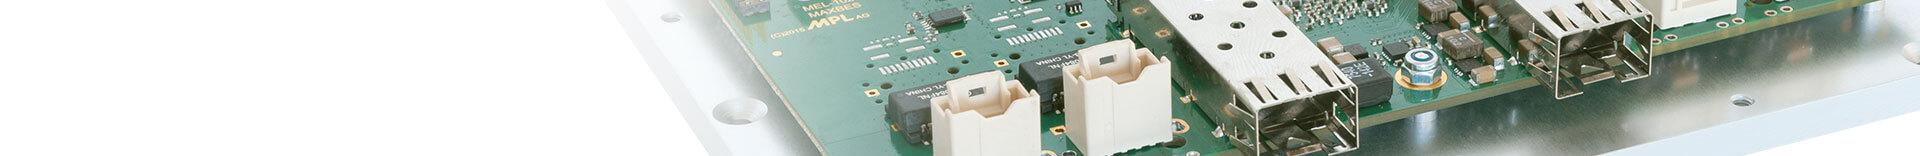 Network solutions: LAN | APLUS SA | Defense & Security